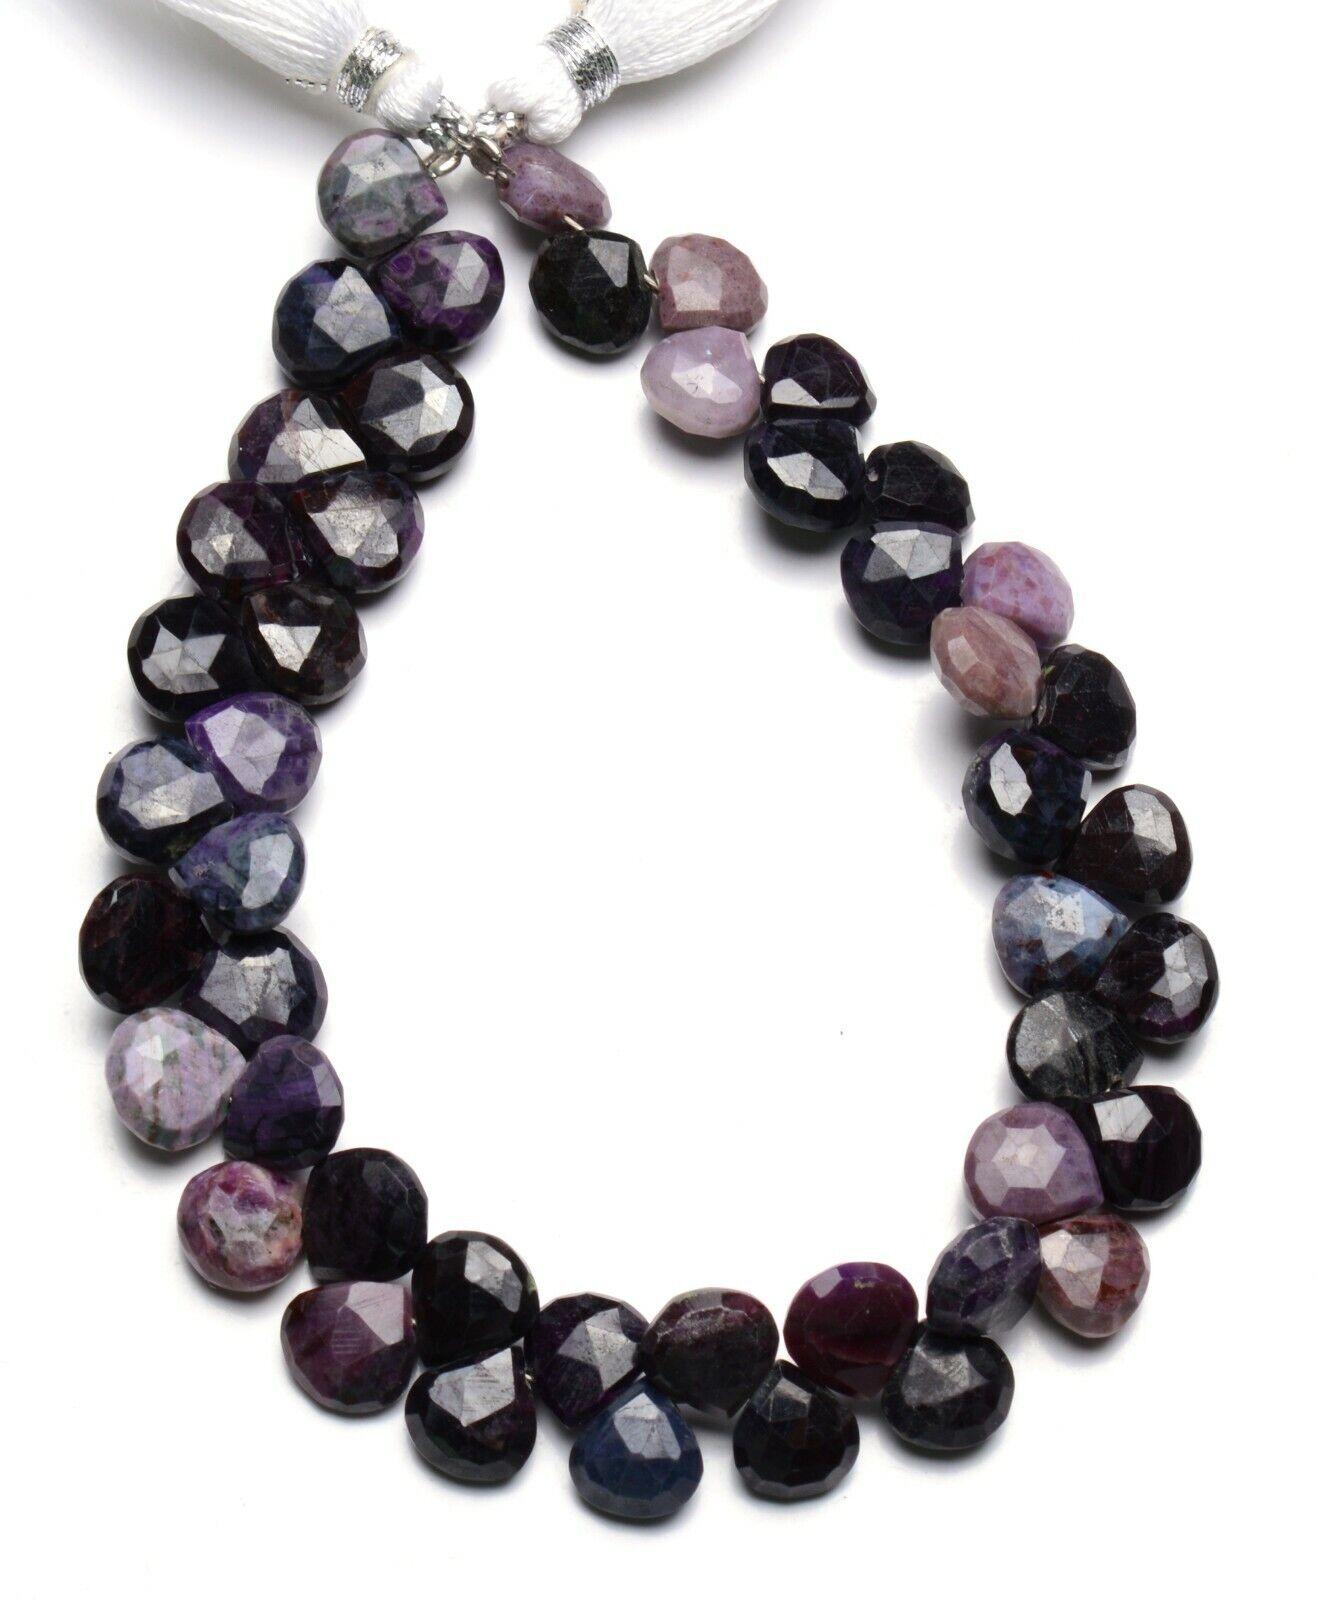 Natural RARE GEM Sugilite 8 mm TAILLE à FACETTES Coeur Forme Perles 8